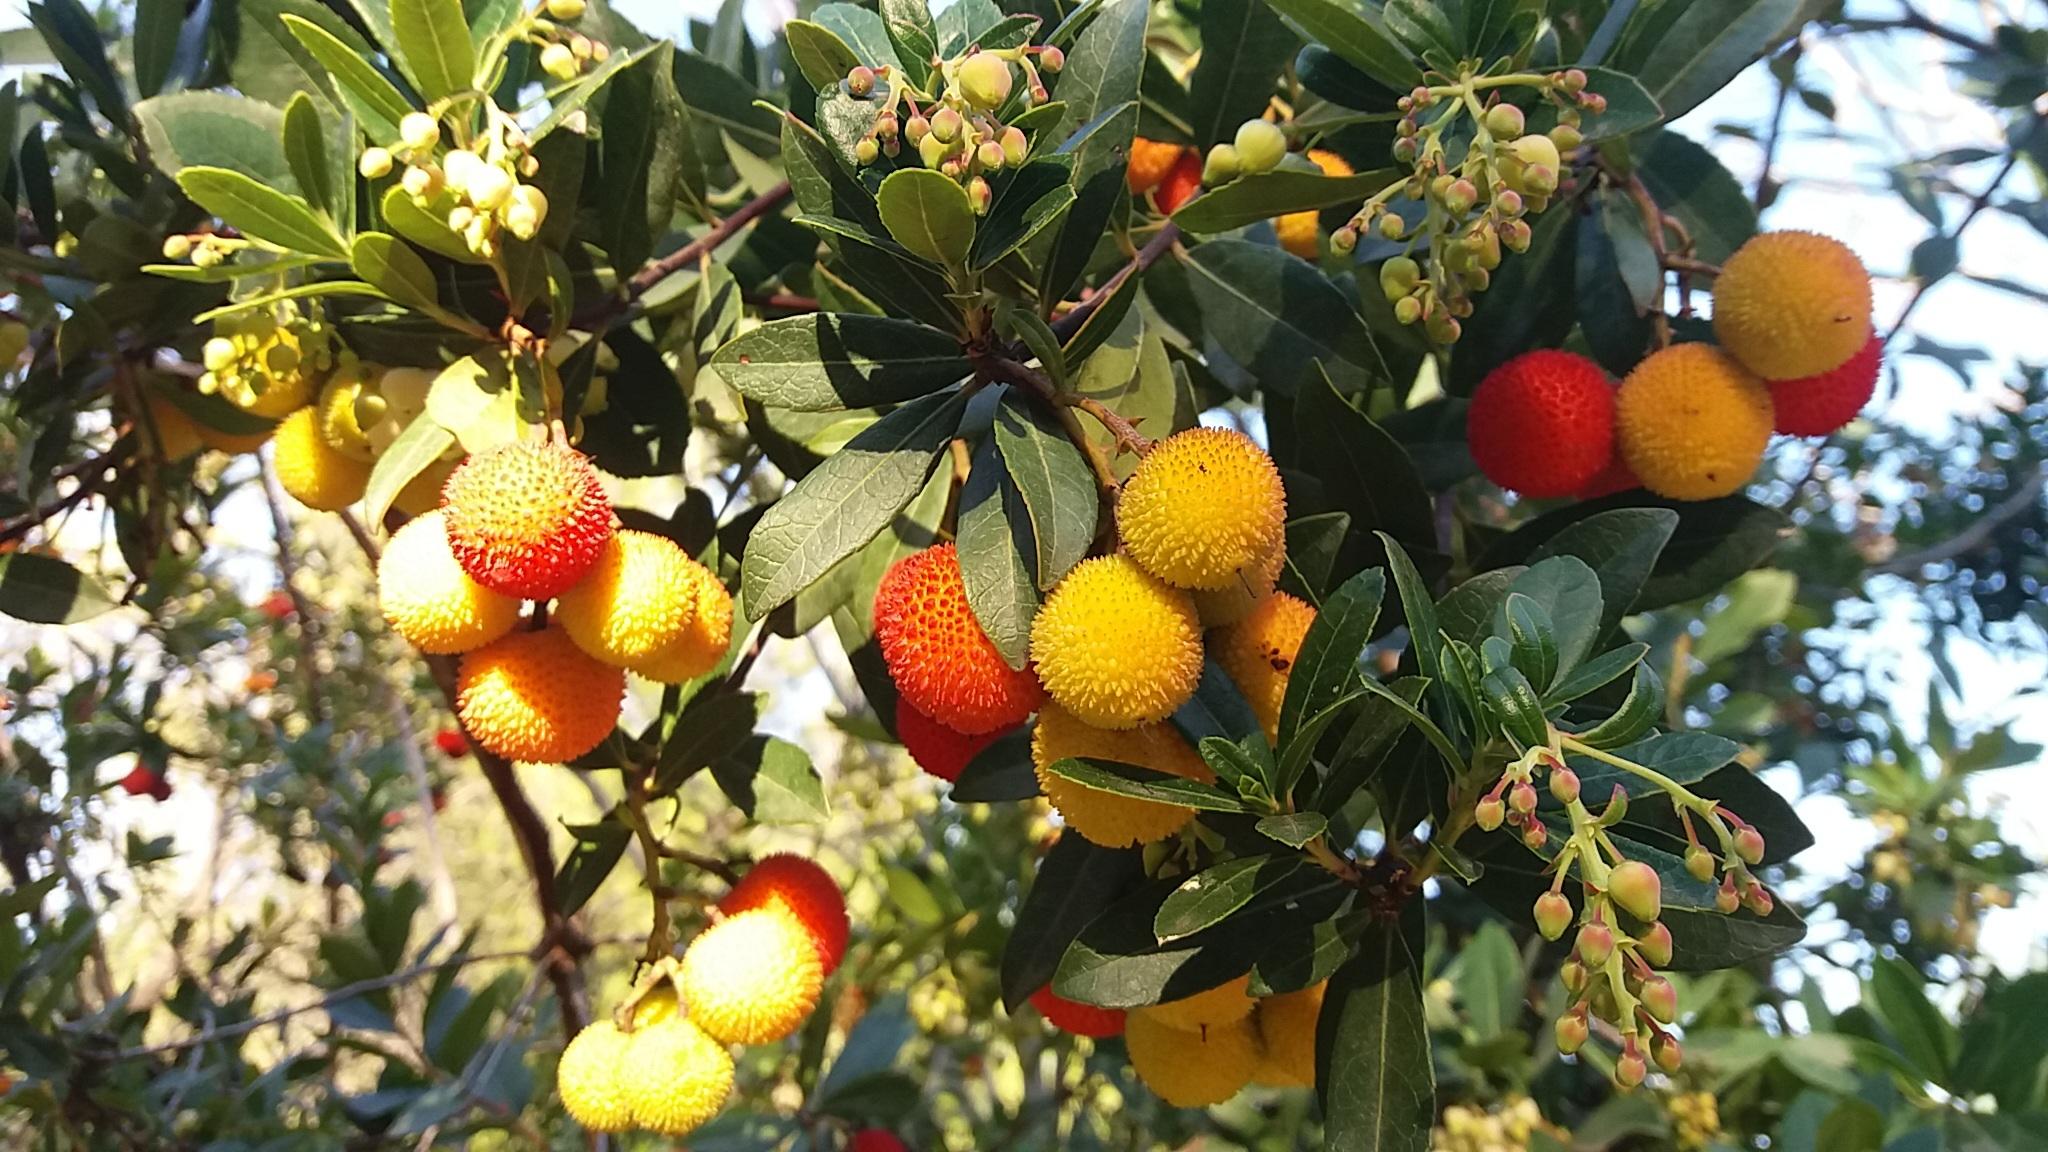 Fotos gratis paisaje naturaleza rama fruta flor comida produce hojas perennes oto o - Planting fruit trees in autumn ...